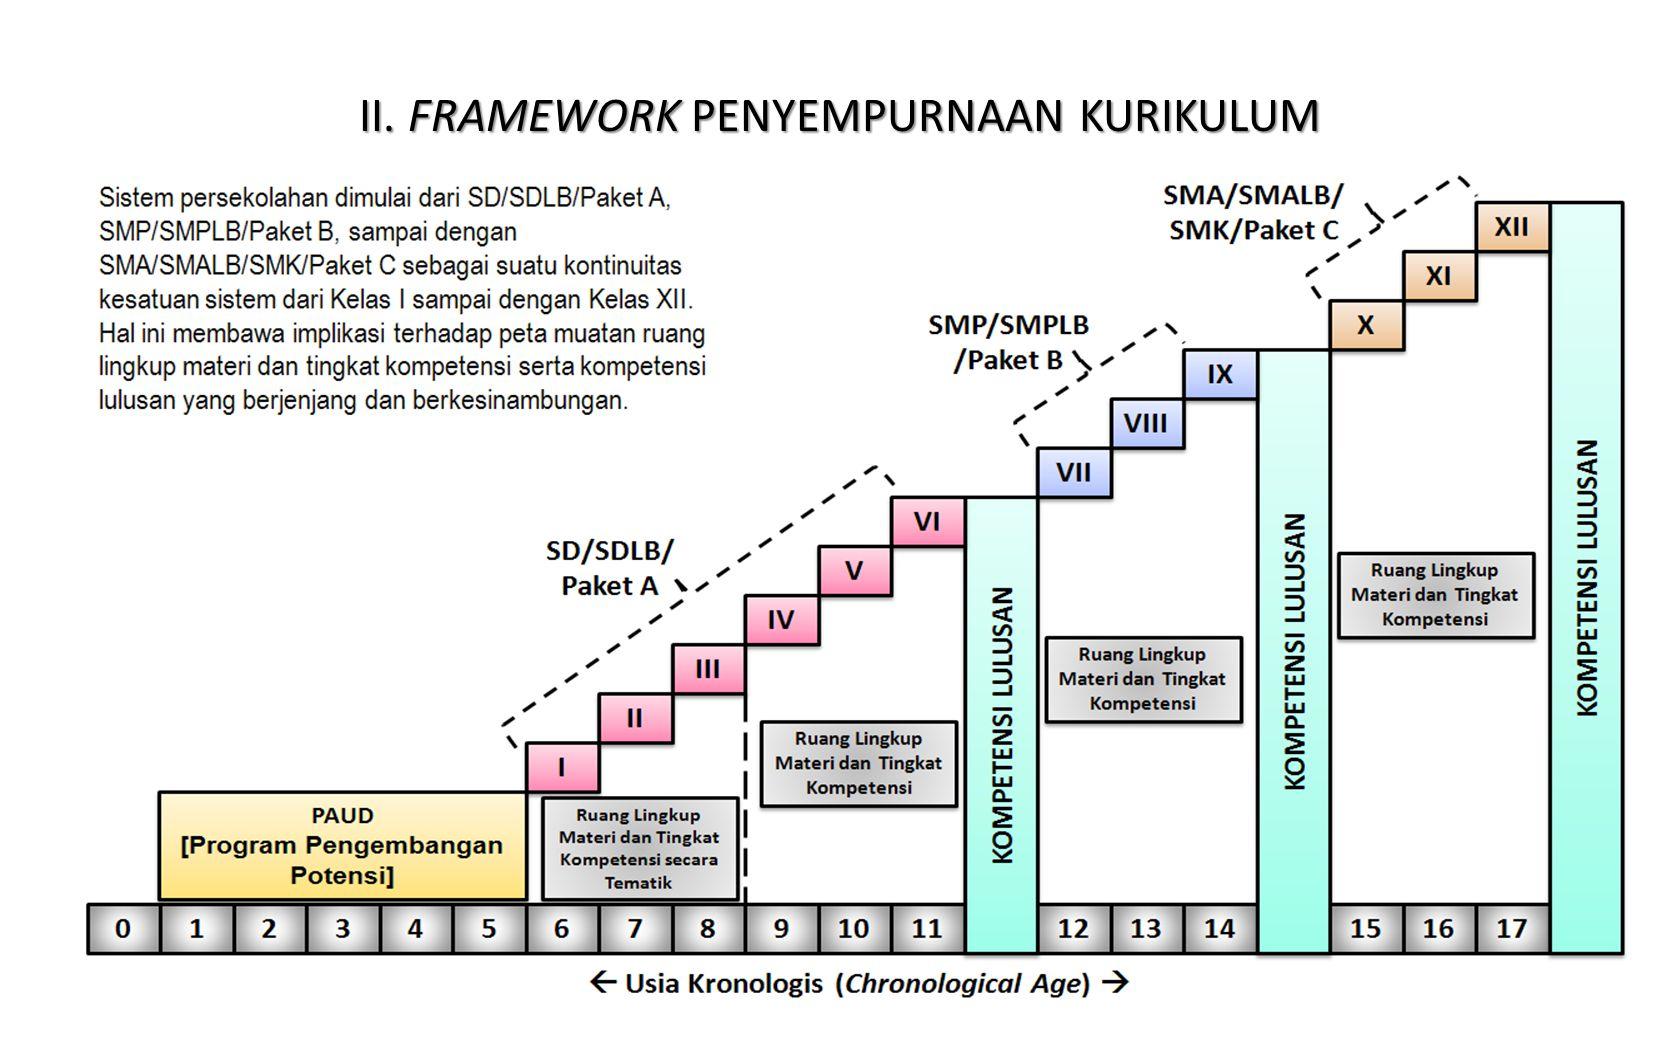 II. FRAMEWORK PENYEMPURNAAN KURIKULUM